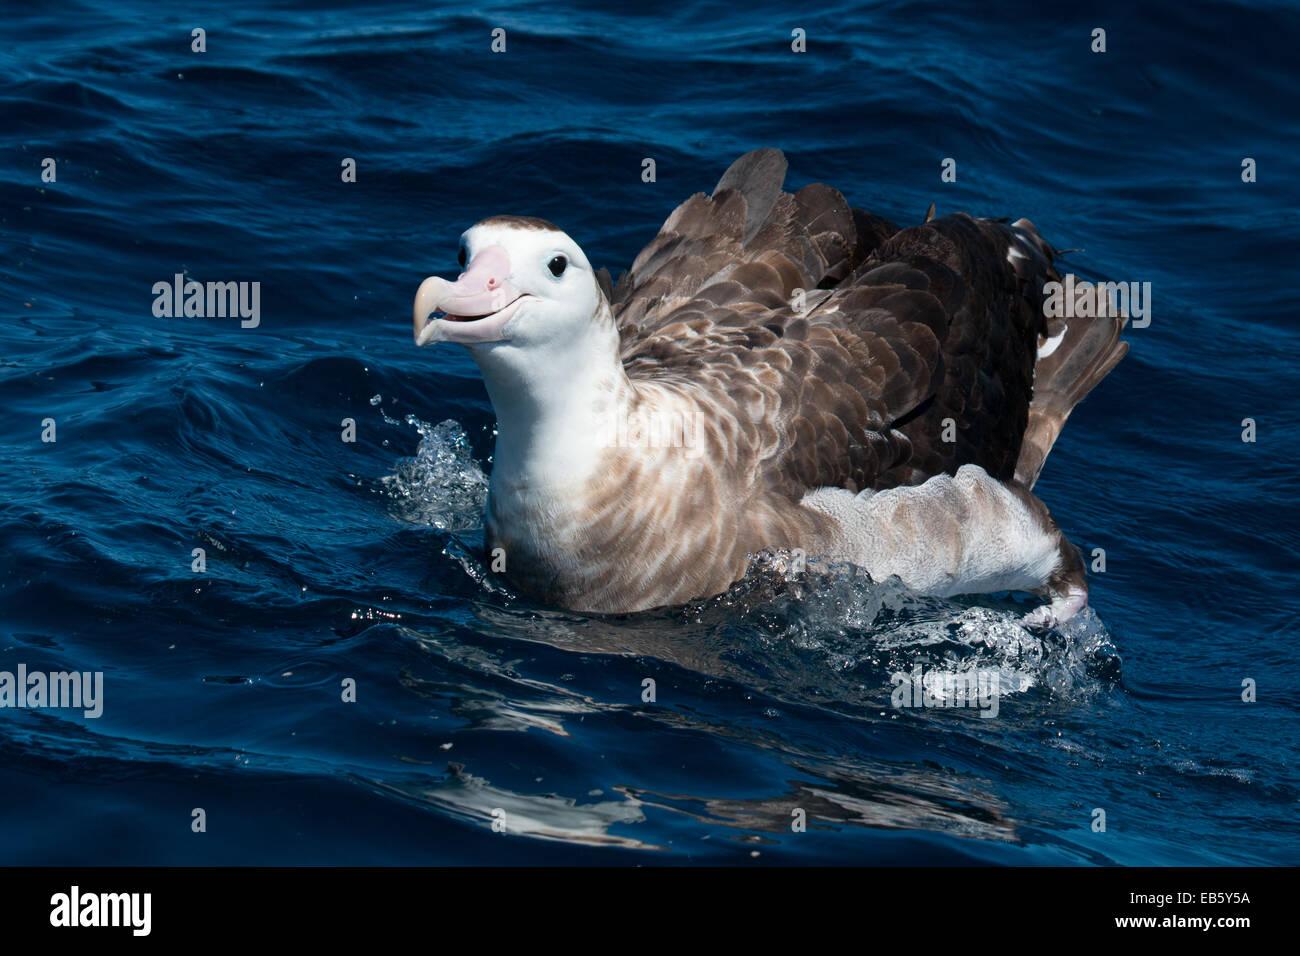 Antipodean Albatross (Diomedea antipodensis) swimming in the ocean - Stock Image